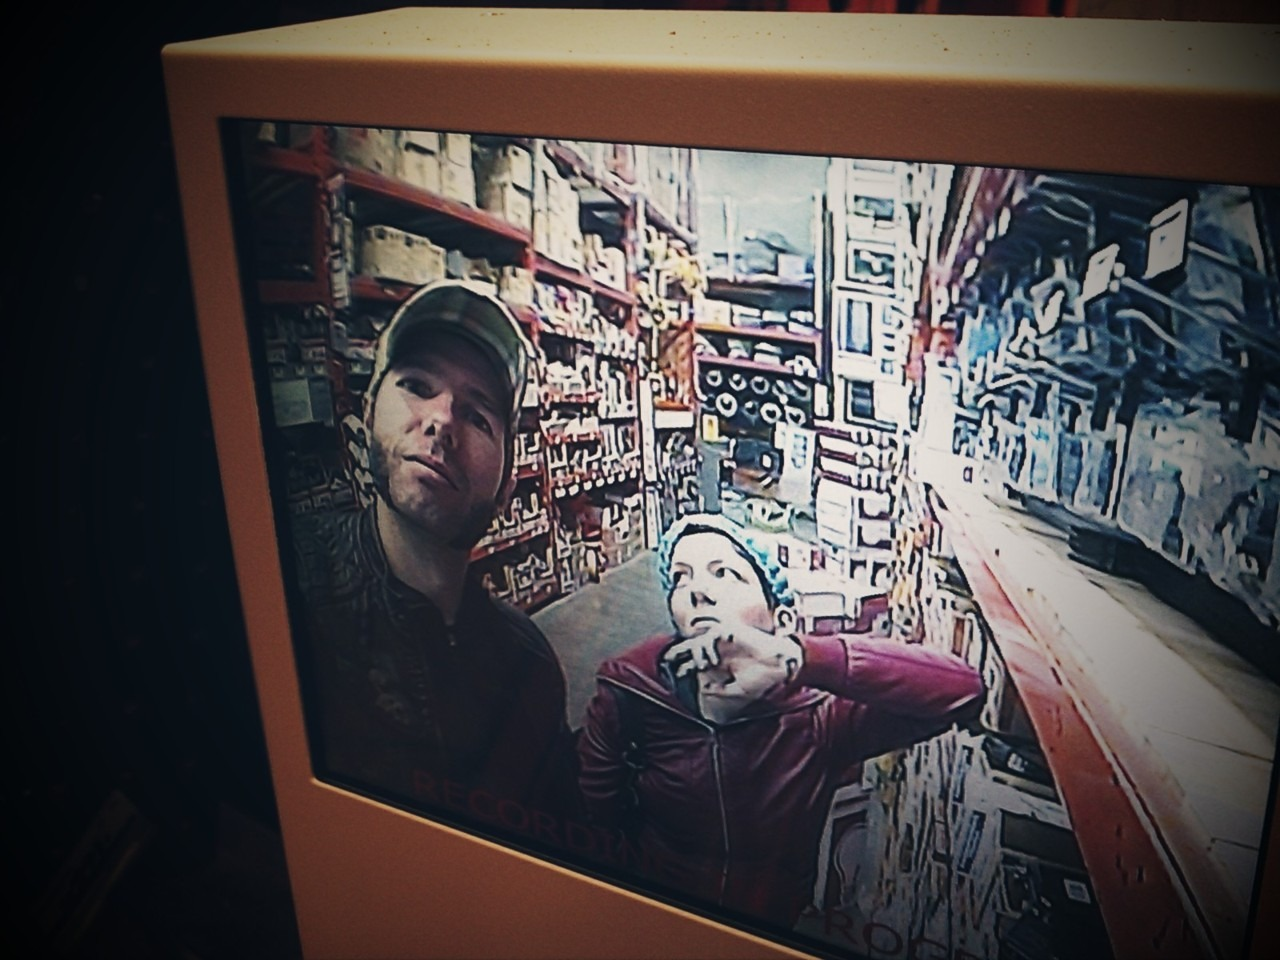 We <3 Home Depot.